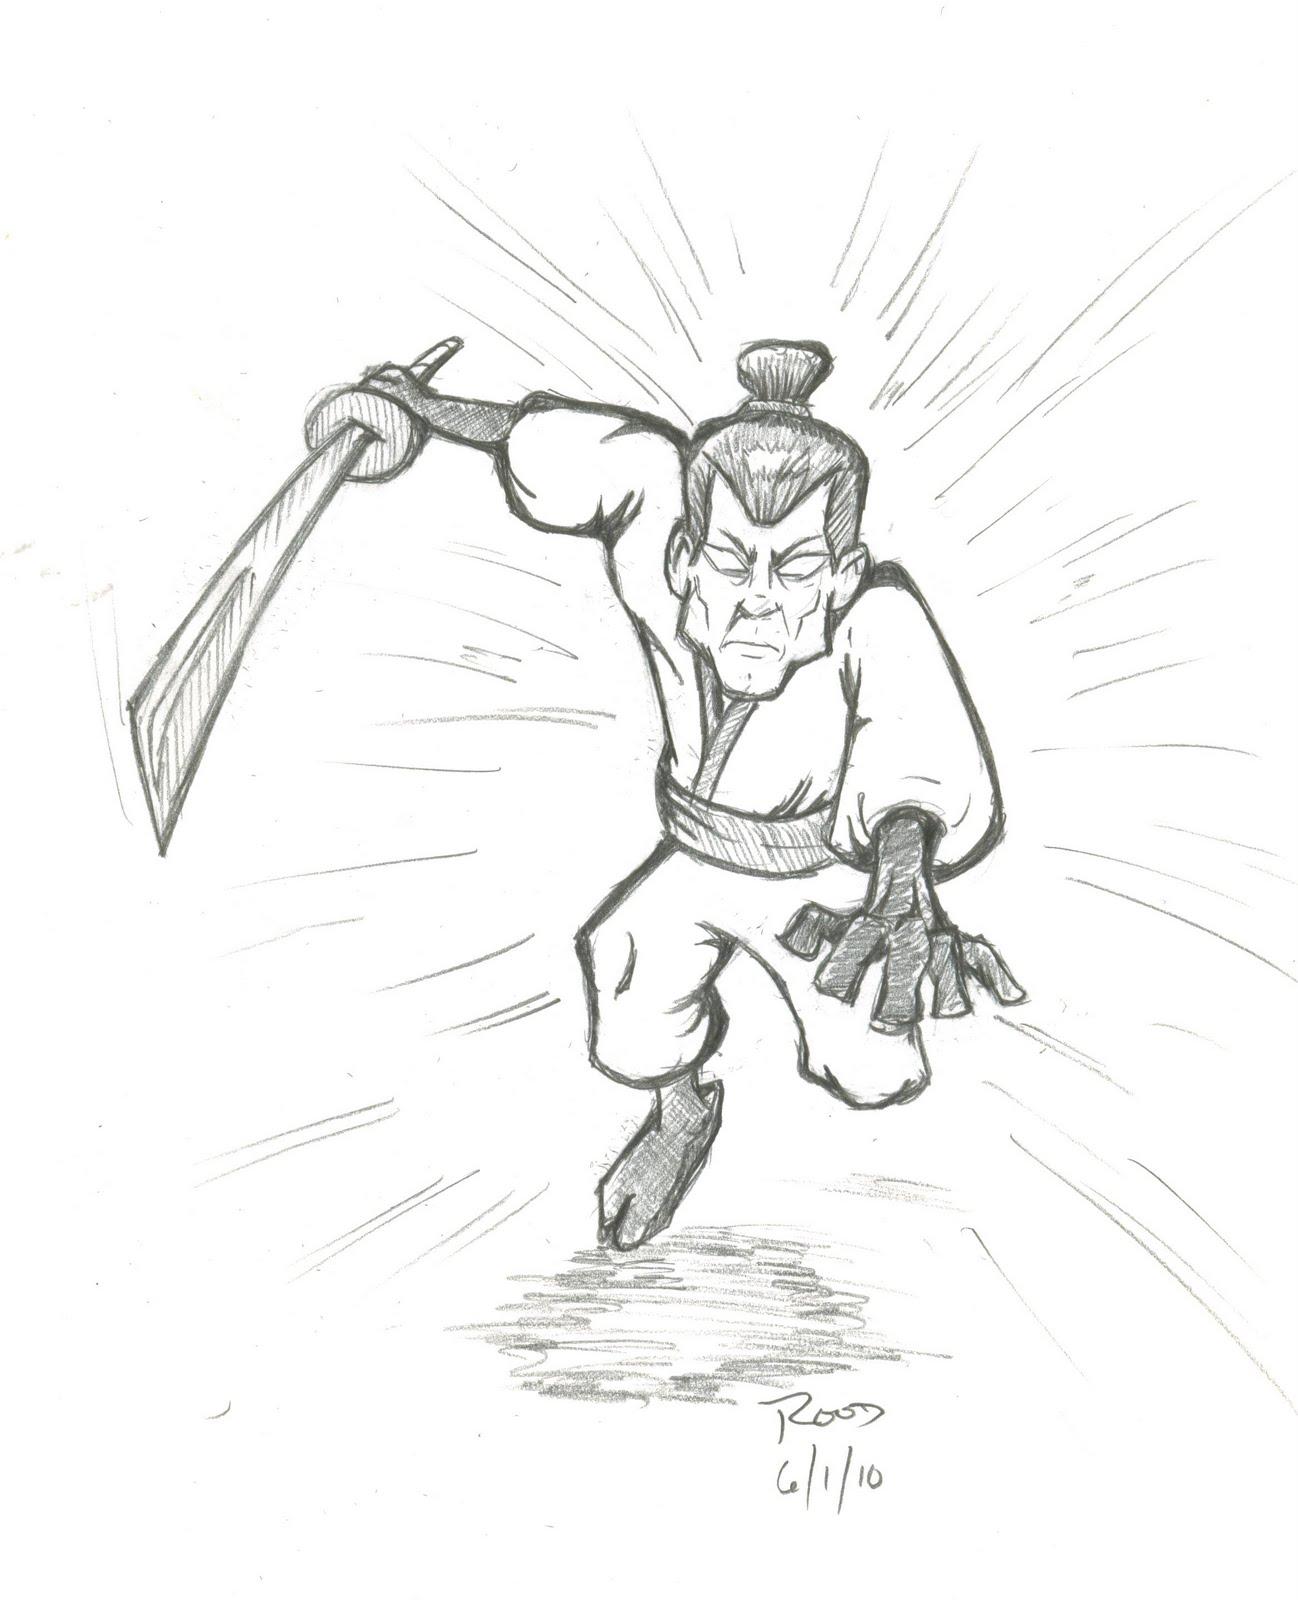 June 1 2010 the running ninja